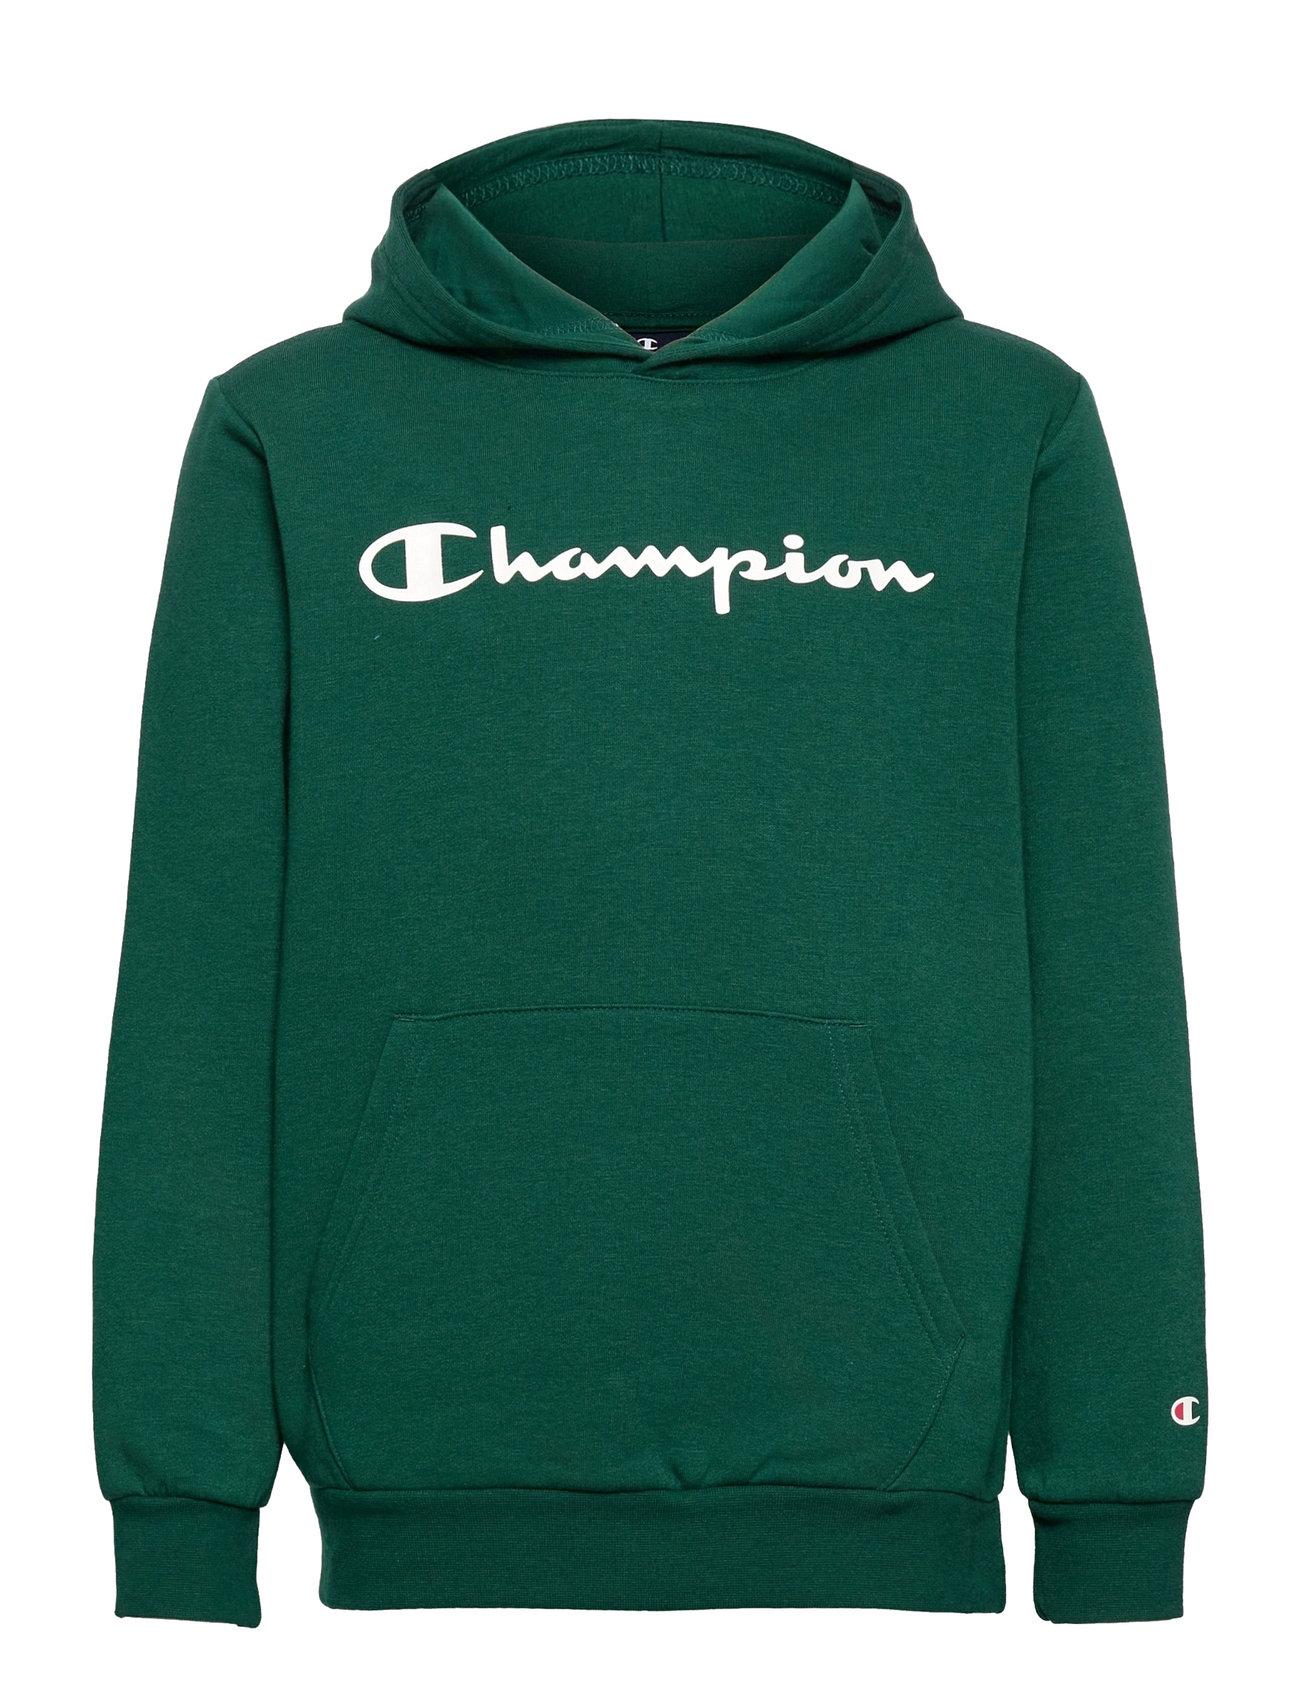 Hooded Sweatshirt Hoodie Trøje Grøn Champion